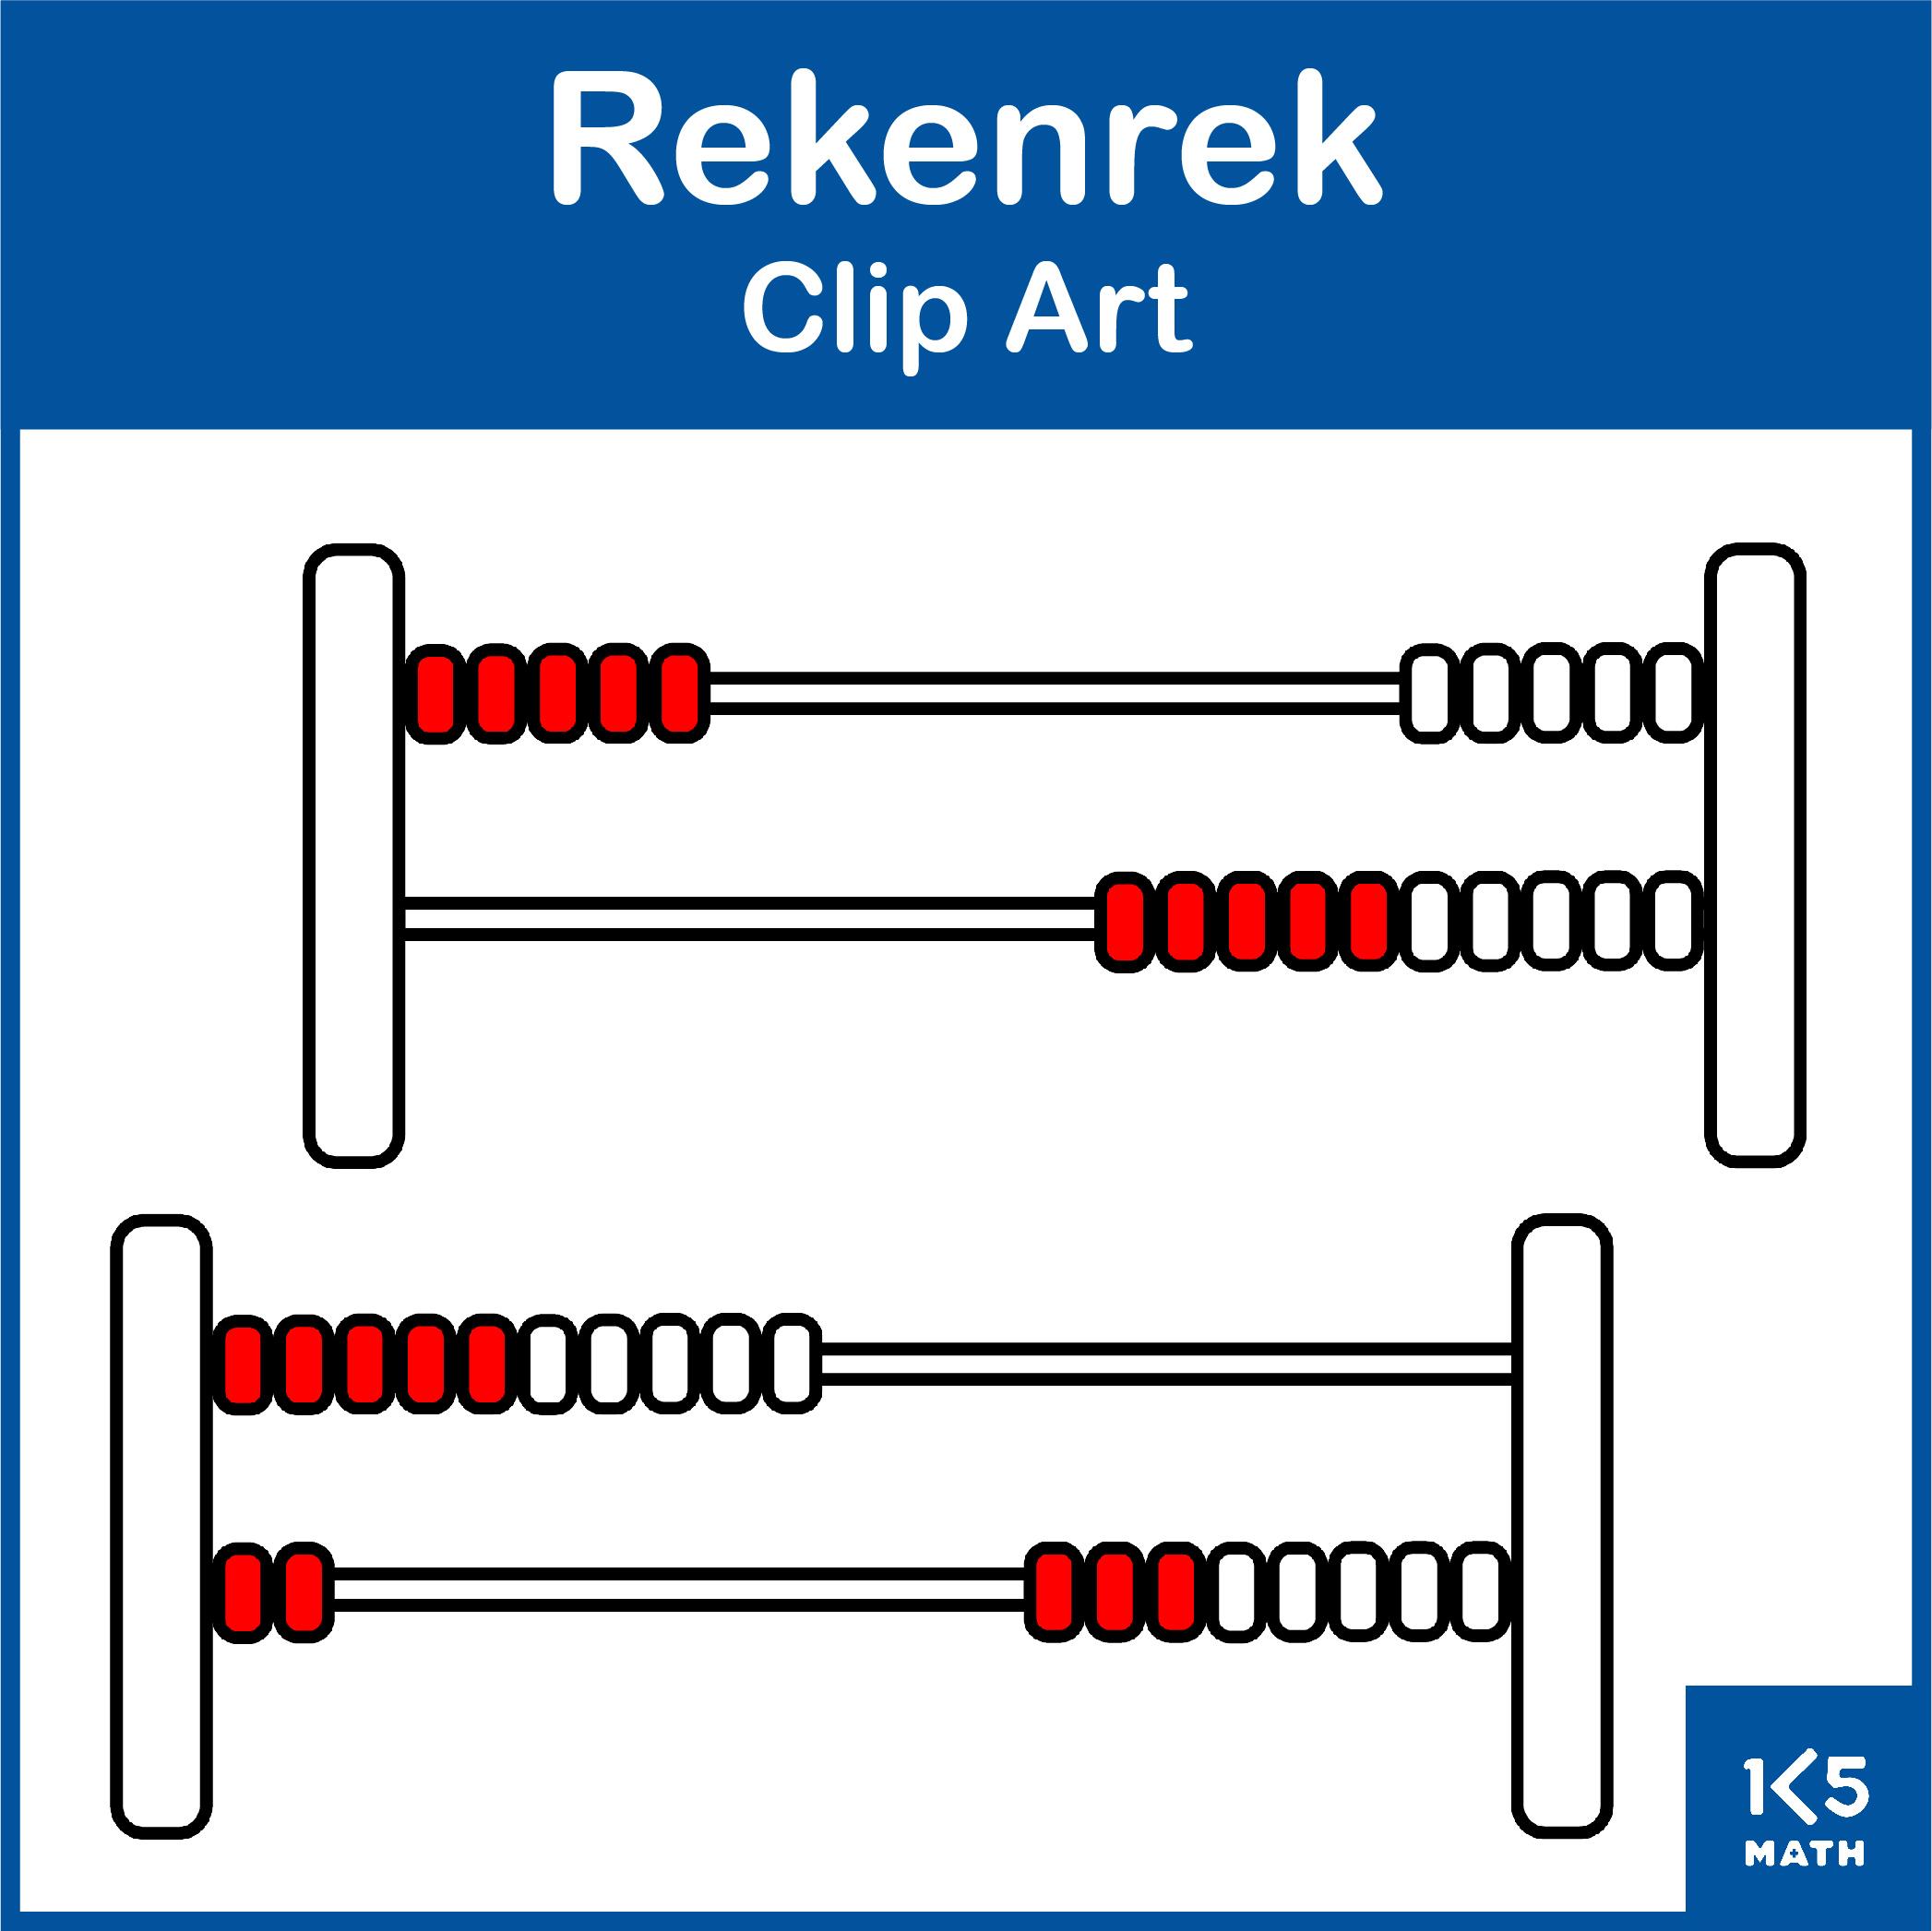 100+ Rekenrek images for your educational resources.